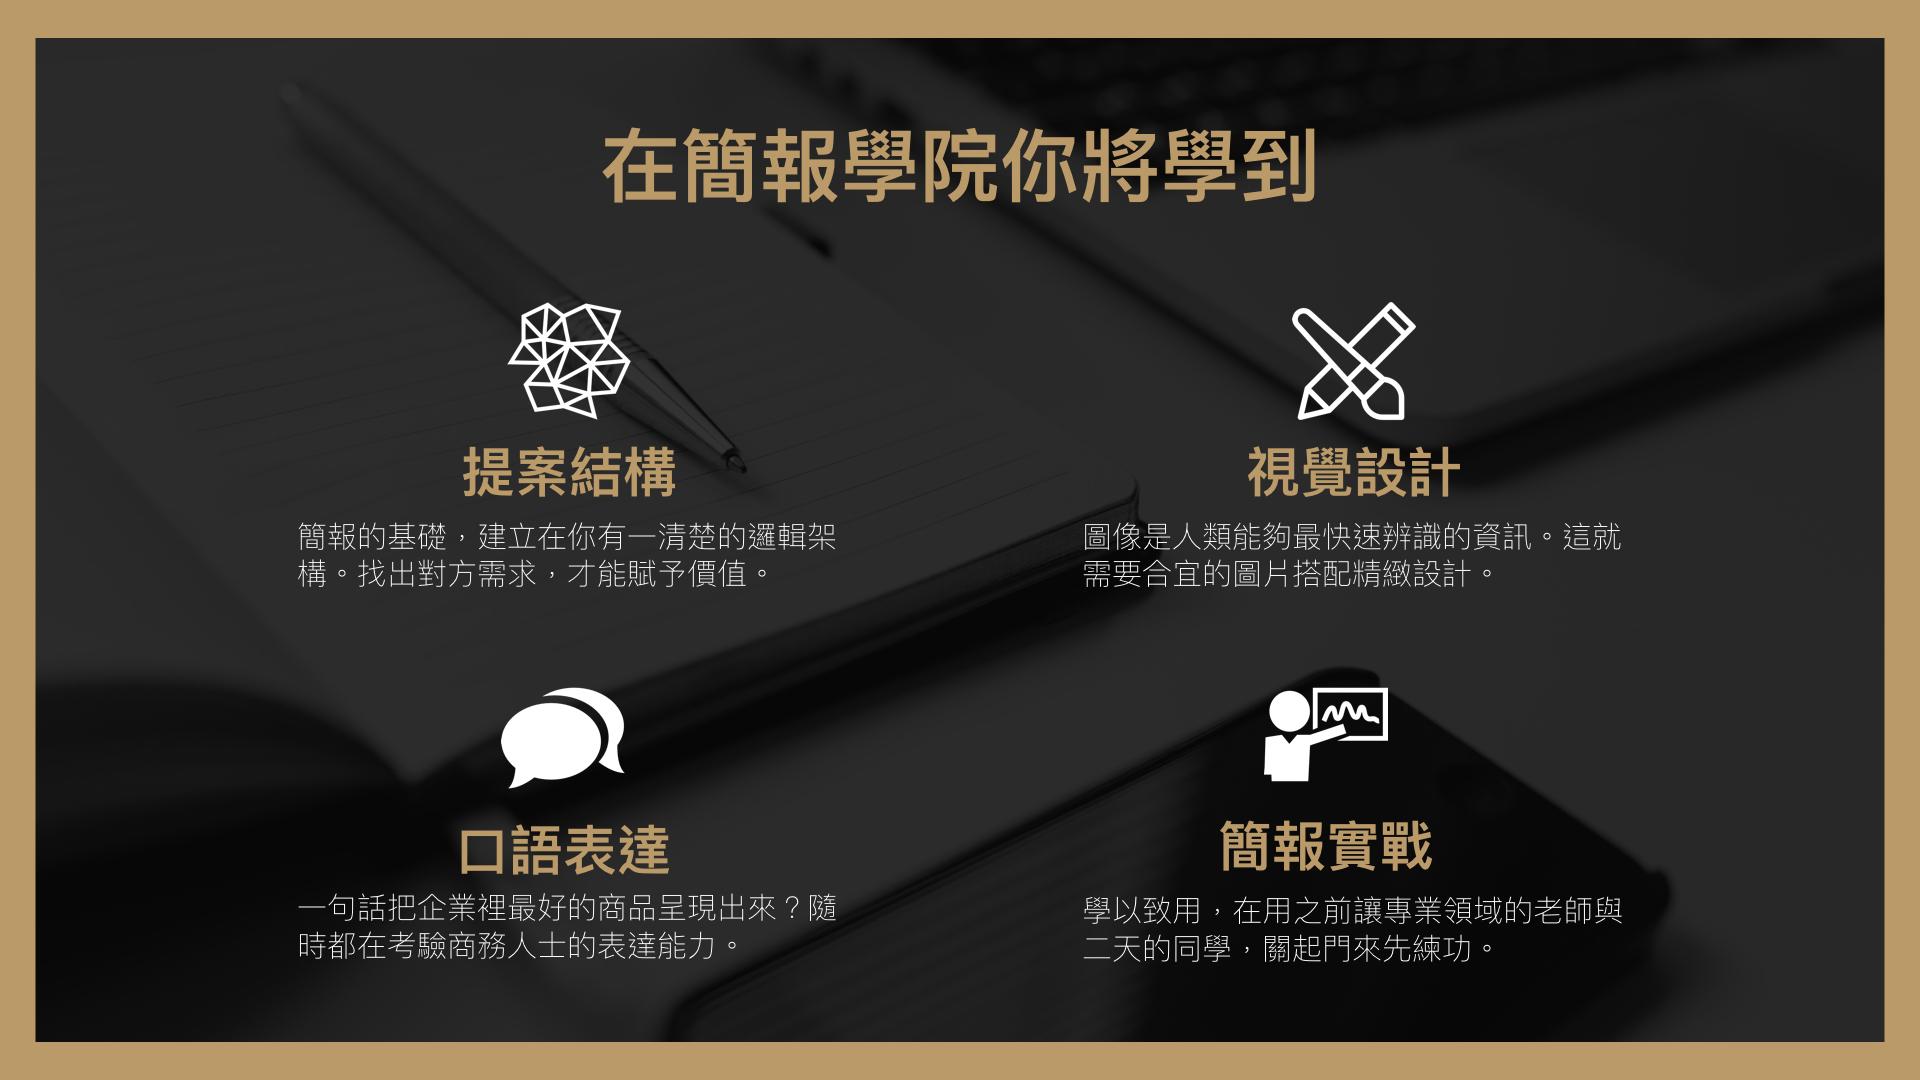 BFAcademy #5 林大班 周震宇.009.jpeg